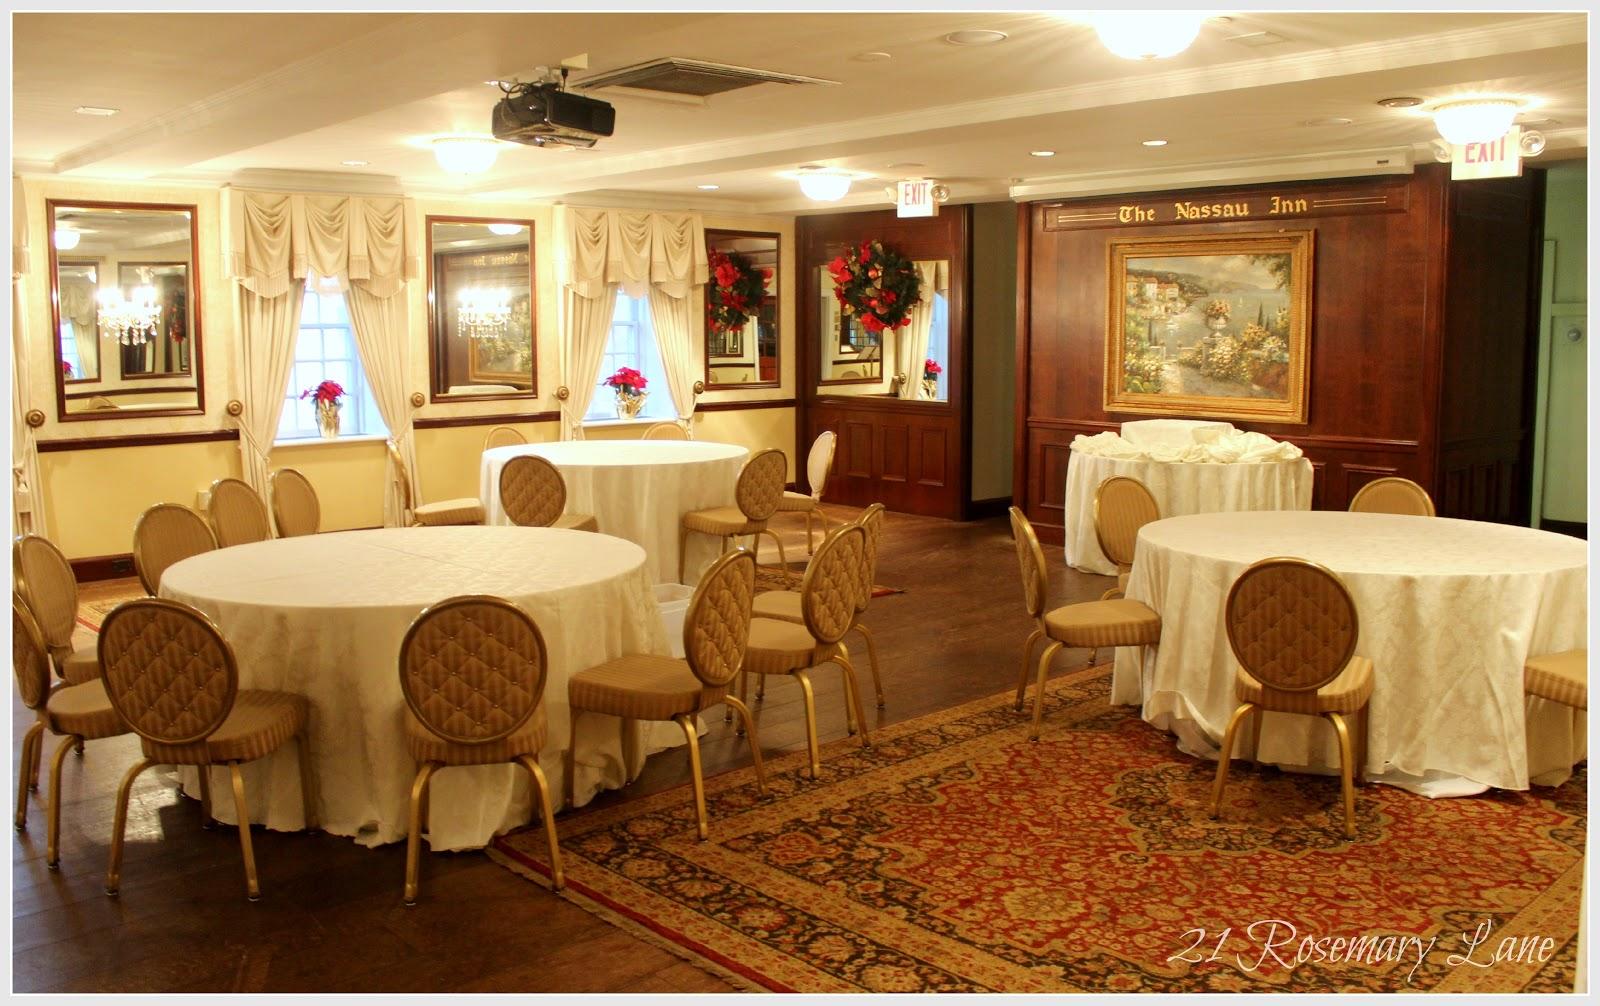 21 Rosemary Lane A Peek Inside Princeton S Historic